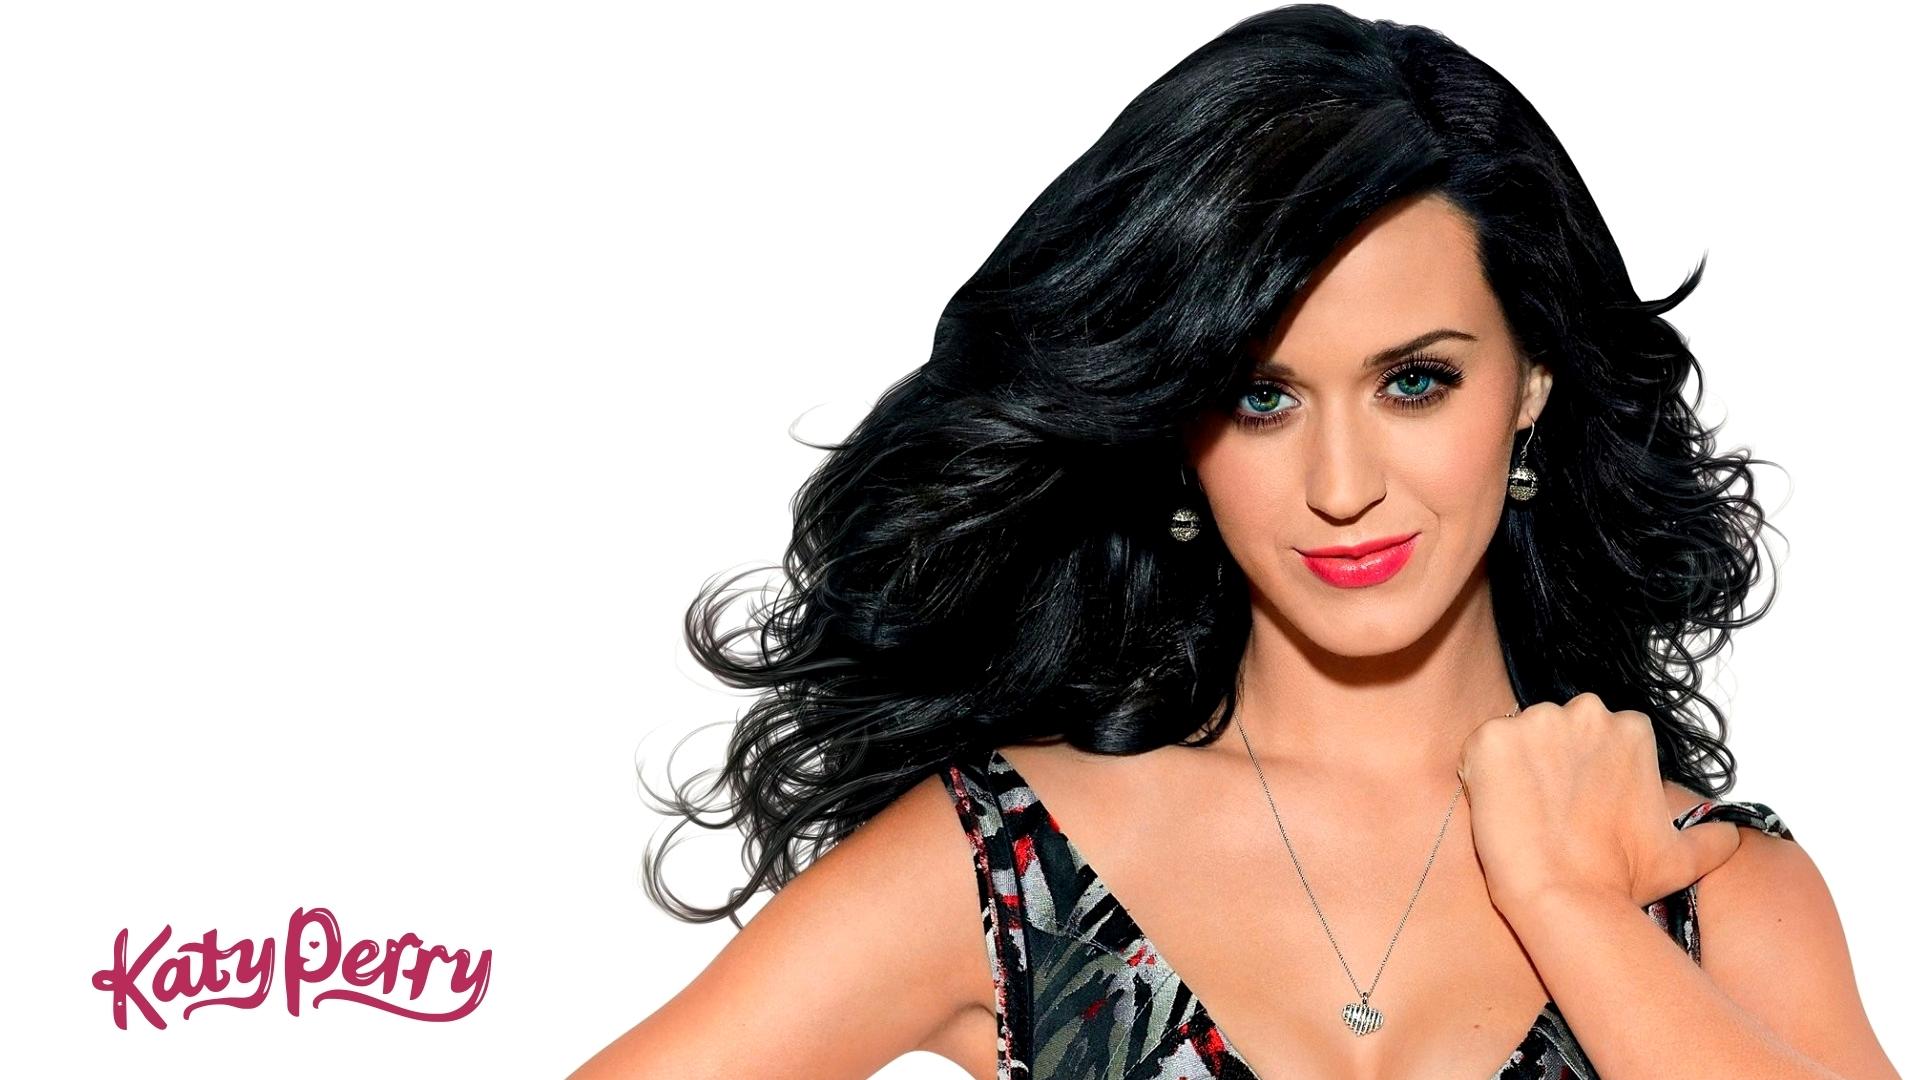 Katy Perry 2013 - 1920x1080